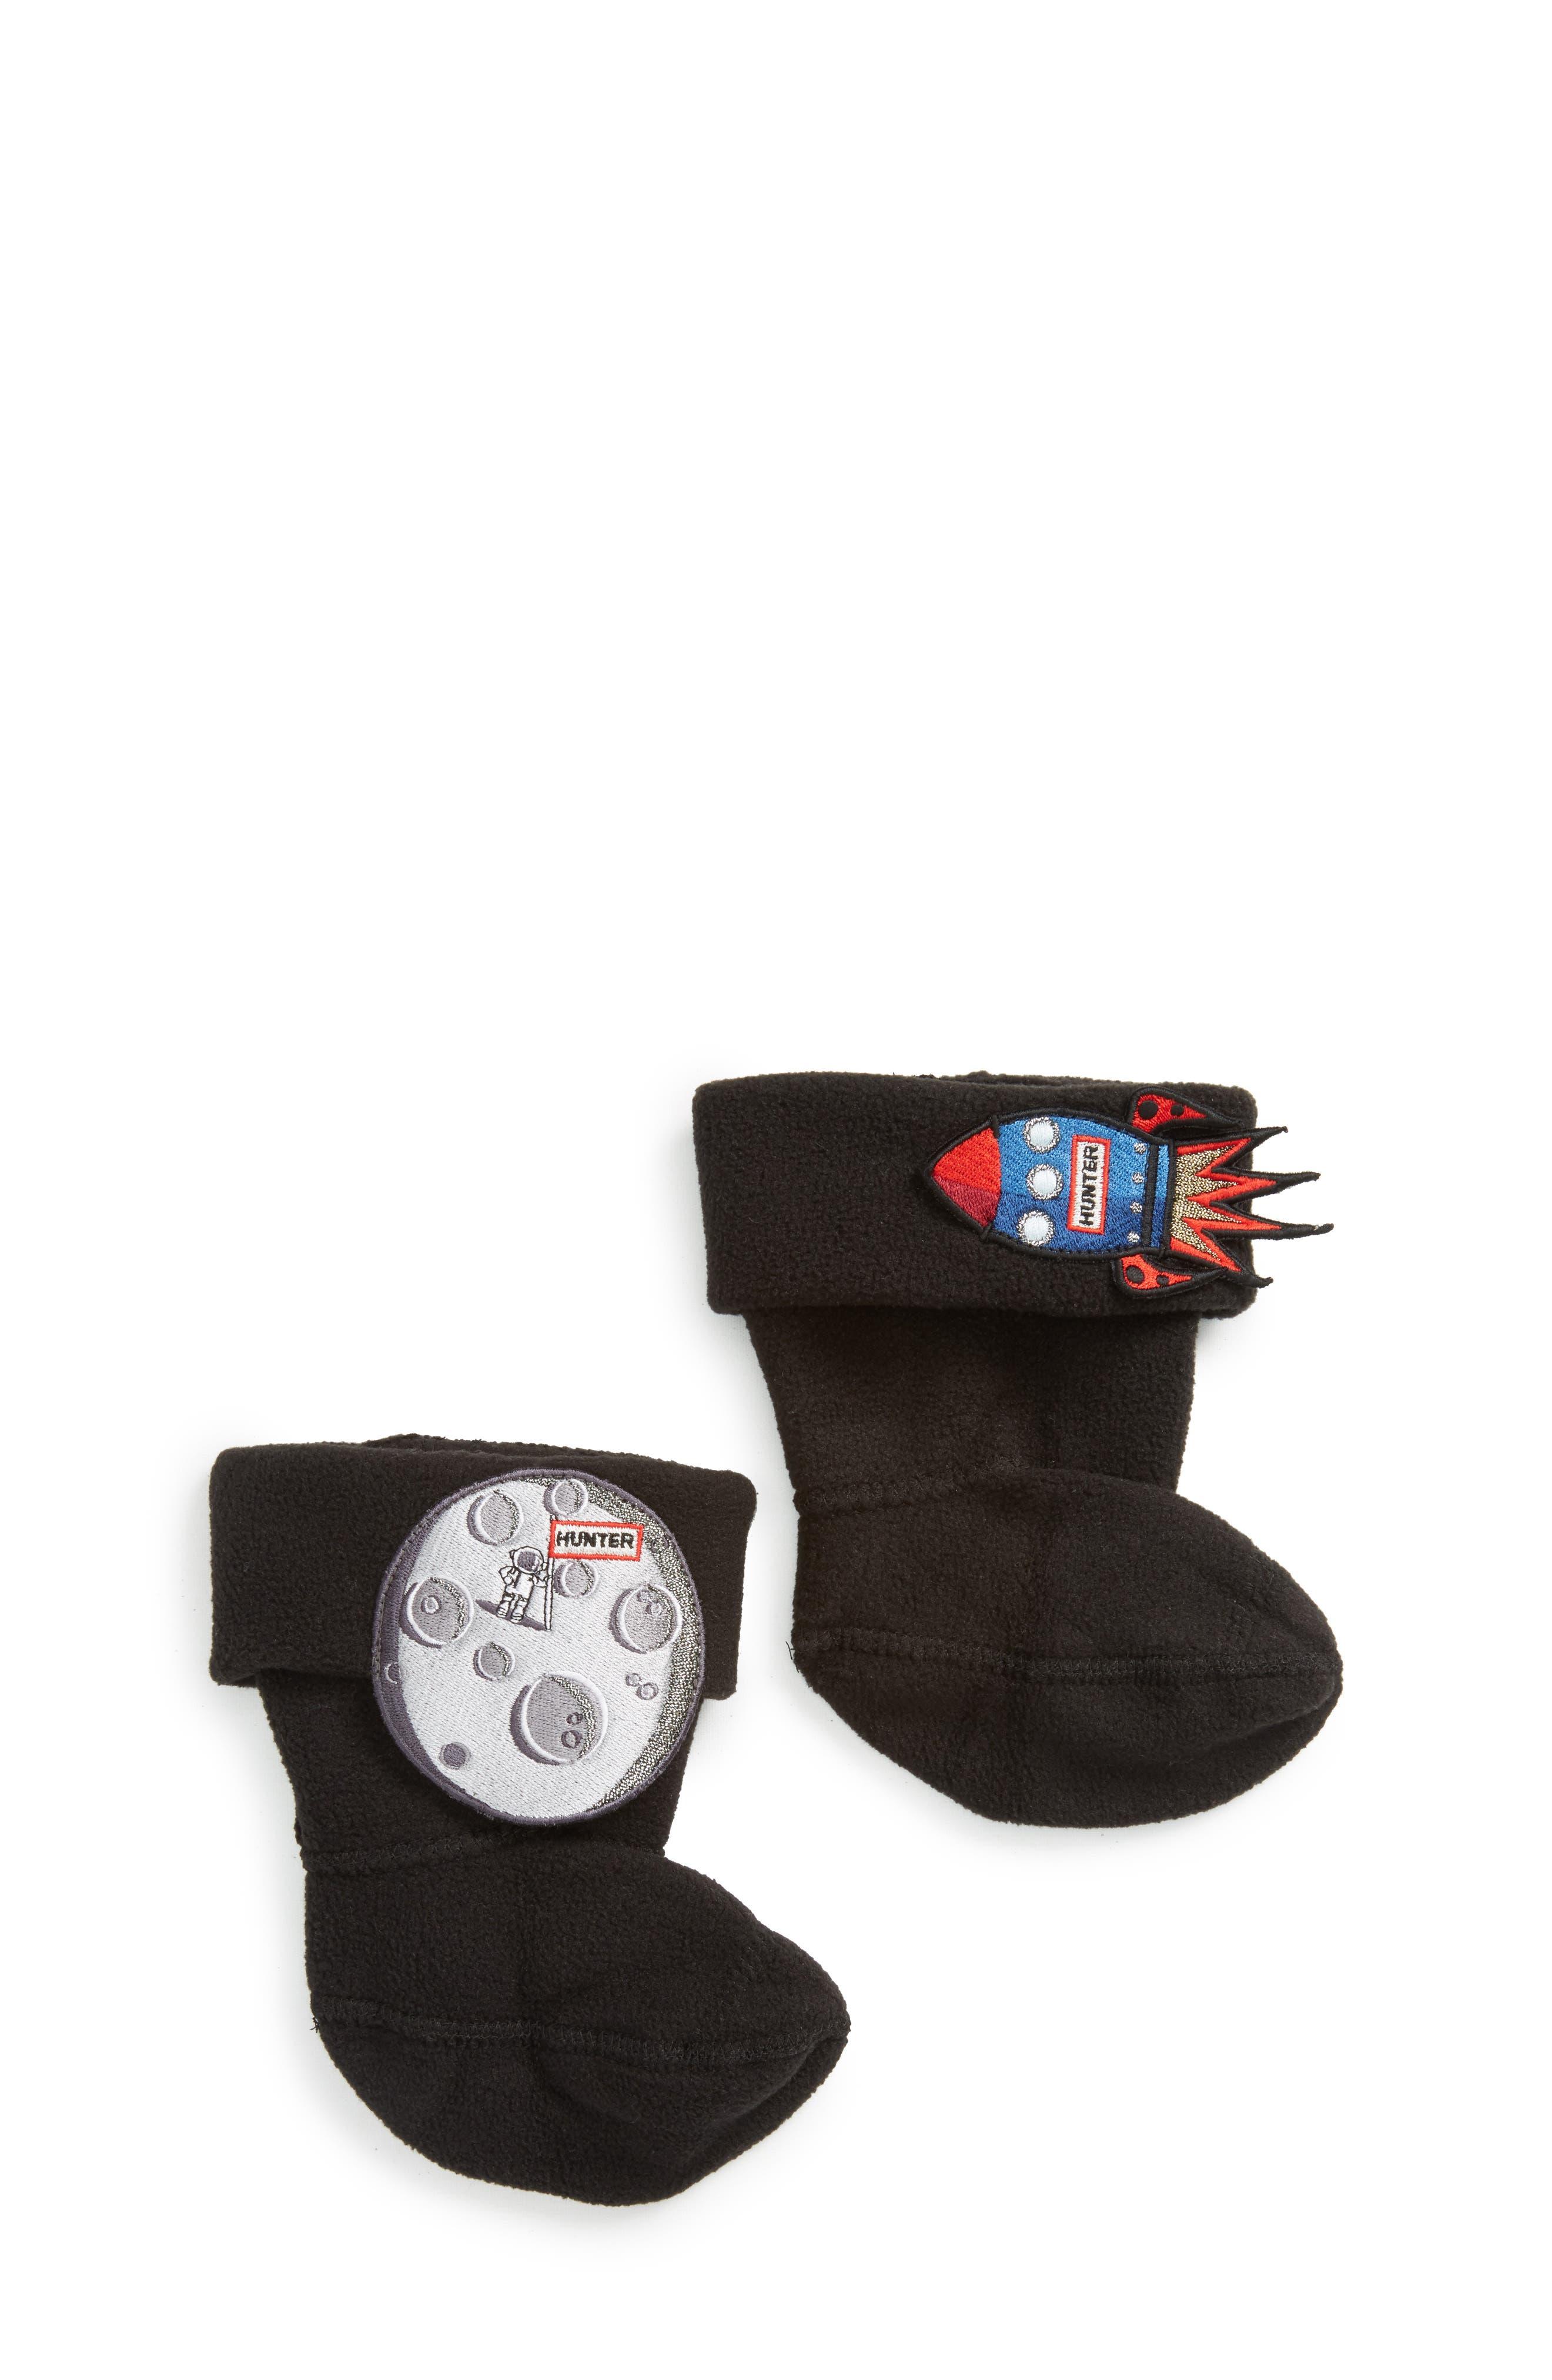 Alternate Image 1 Selected - Hunter Spaceship/Moon Boot Socks (Walker, Toddler & Little Kid)